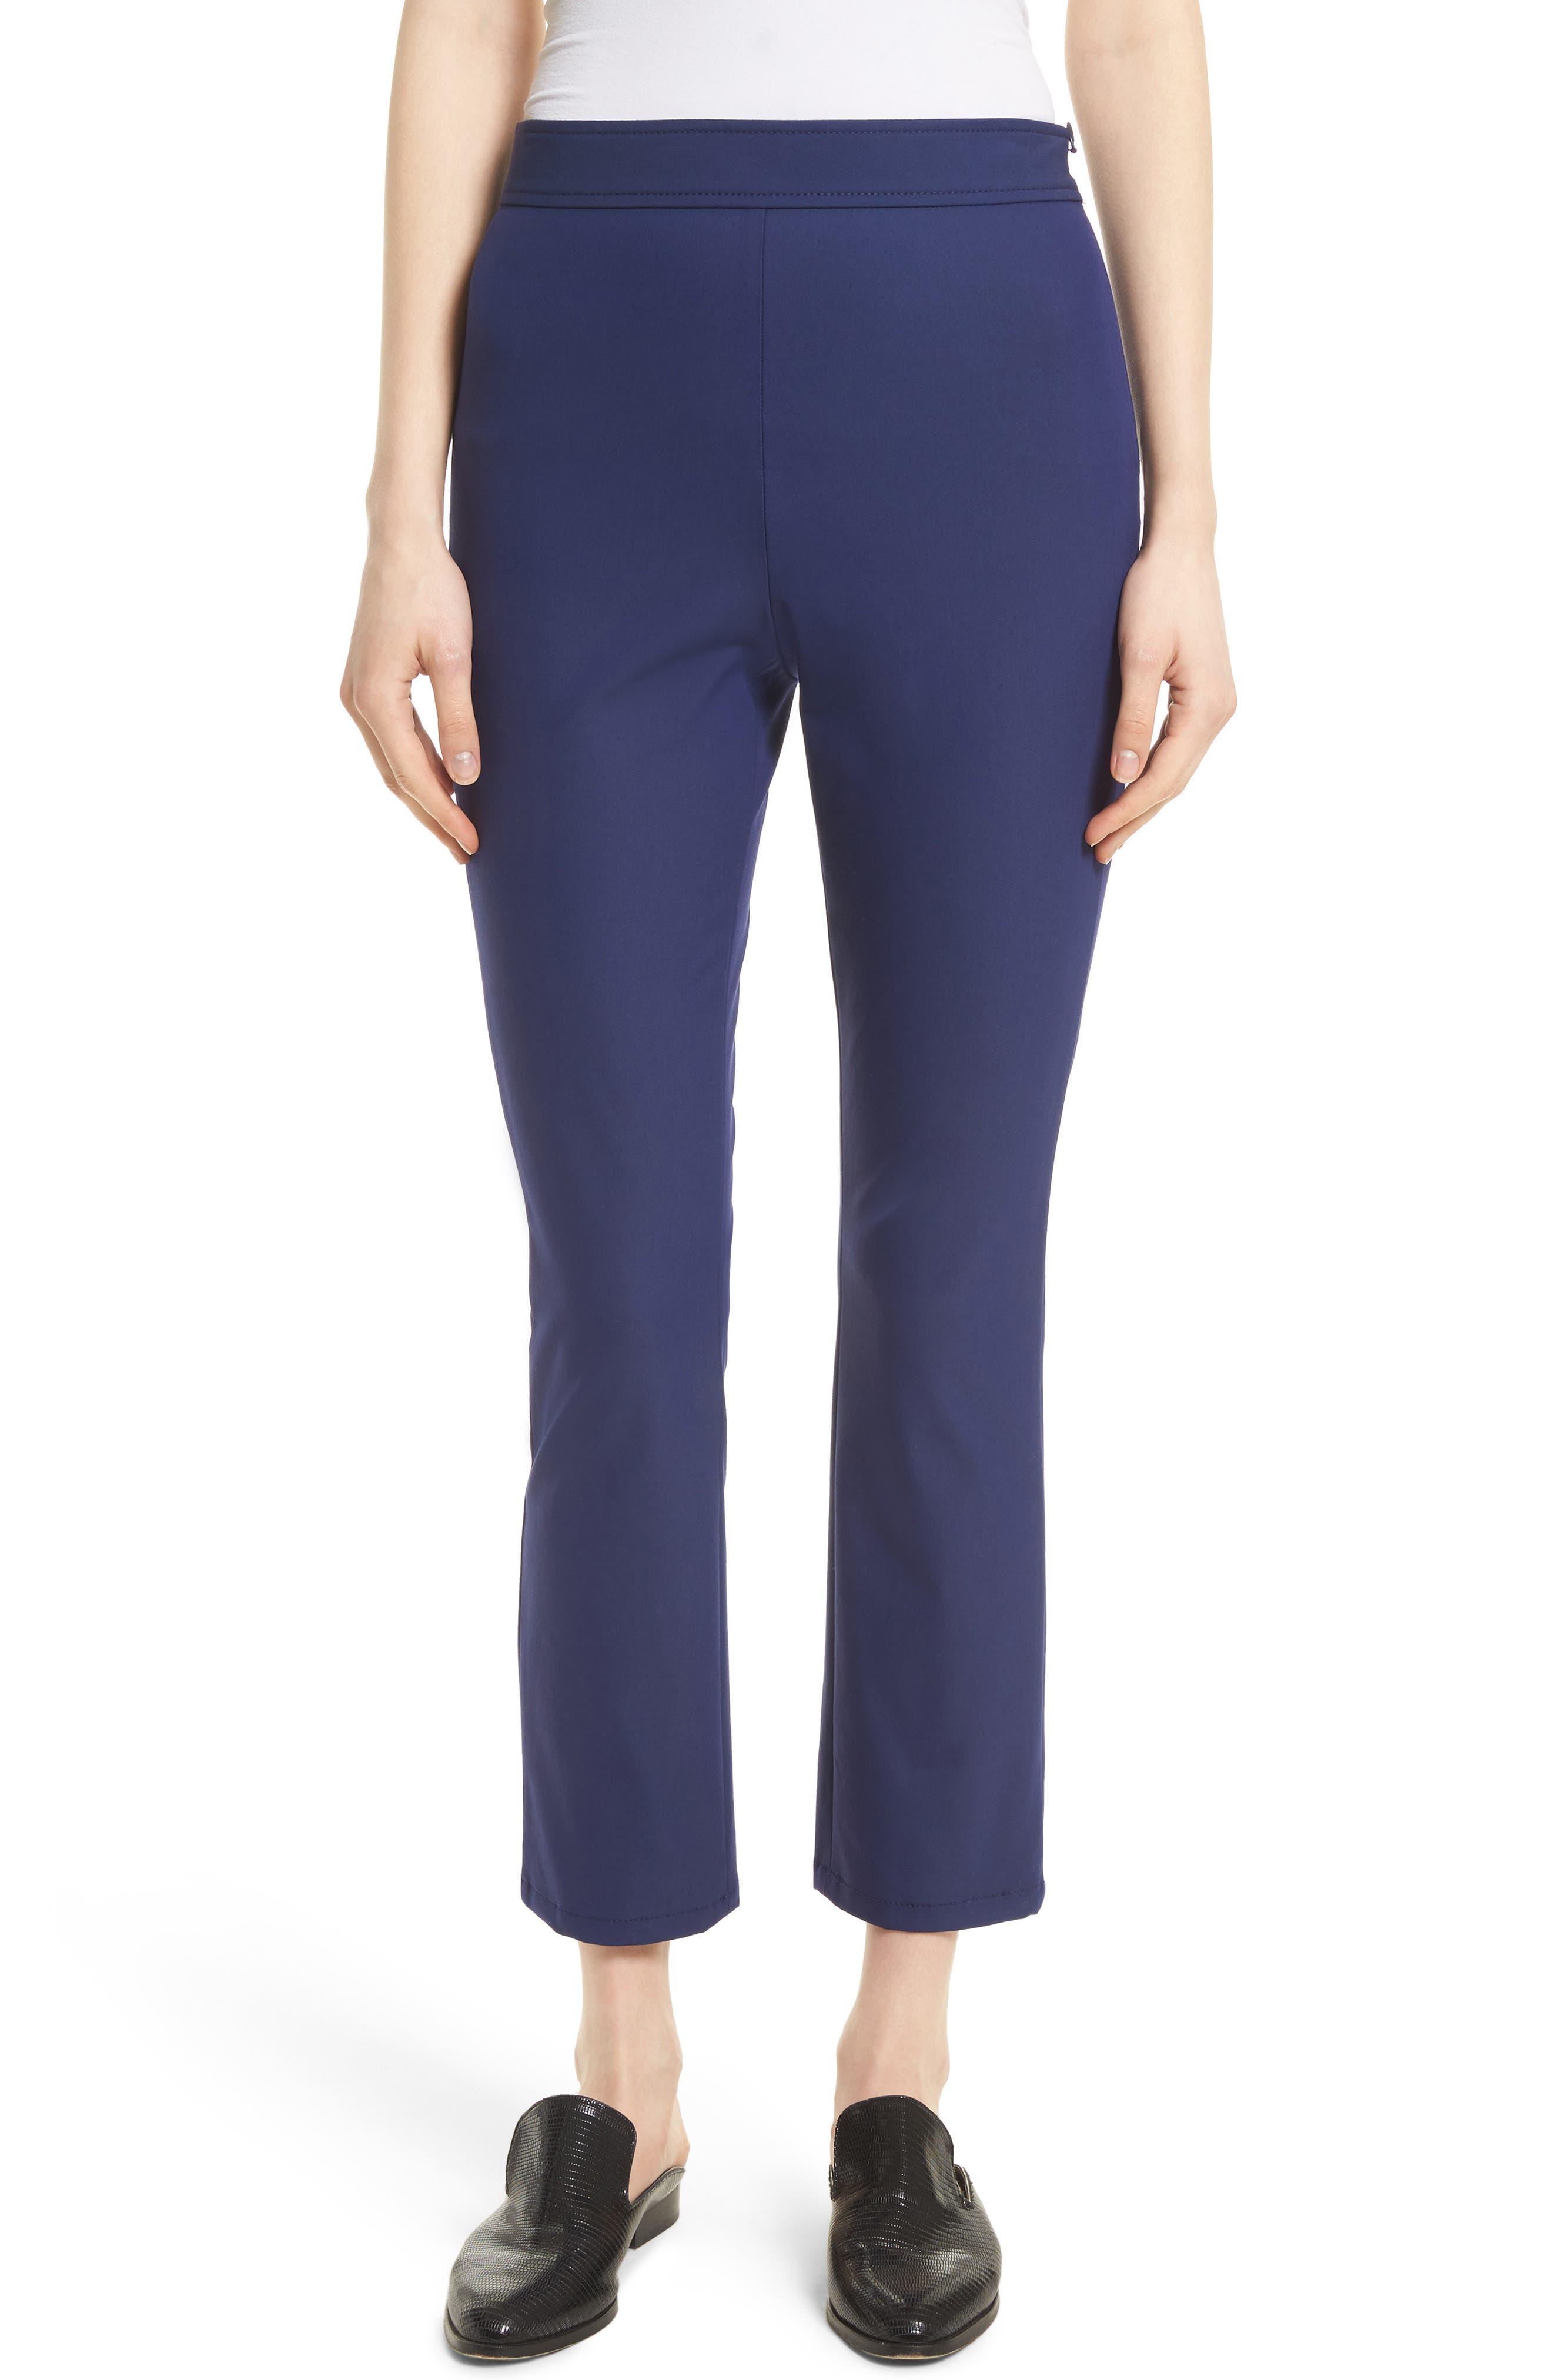 Bimsa Approach Pants,                         Main,                         color, Sapphire Blue